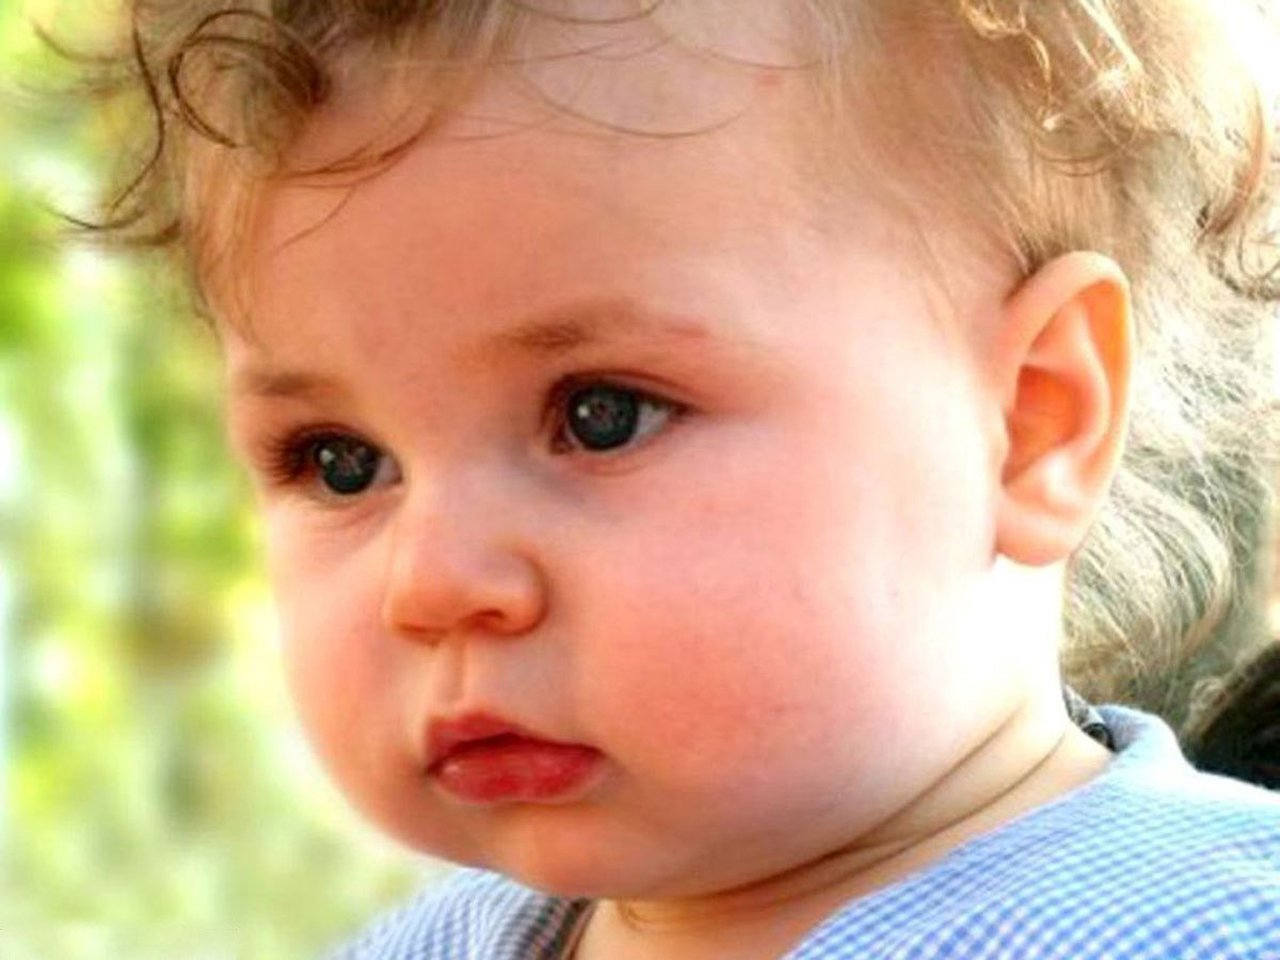 Wallpaper download baby boy - Cute Little Baby Boy With Blue Eyes Hd Wallpaper Cute Little Babies